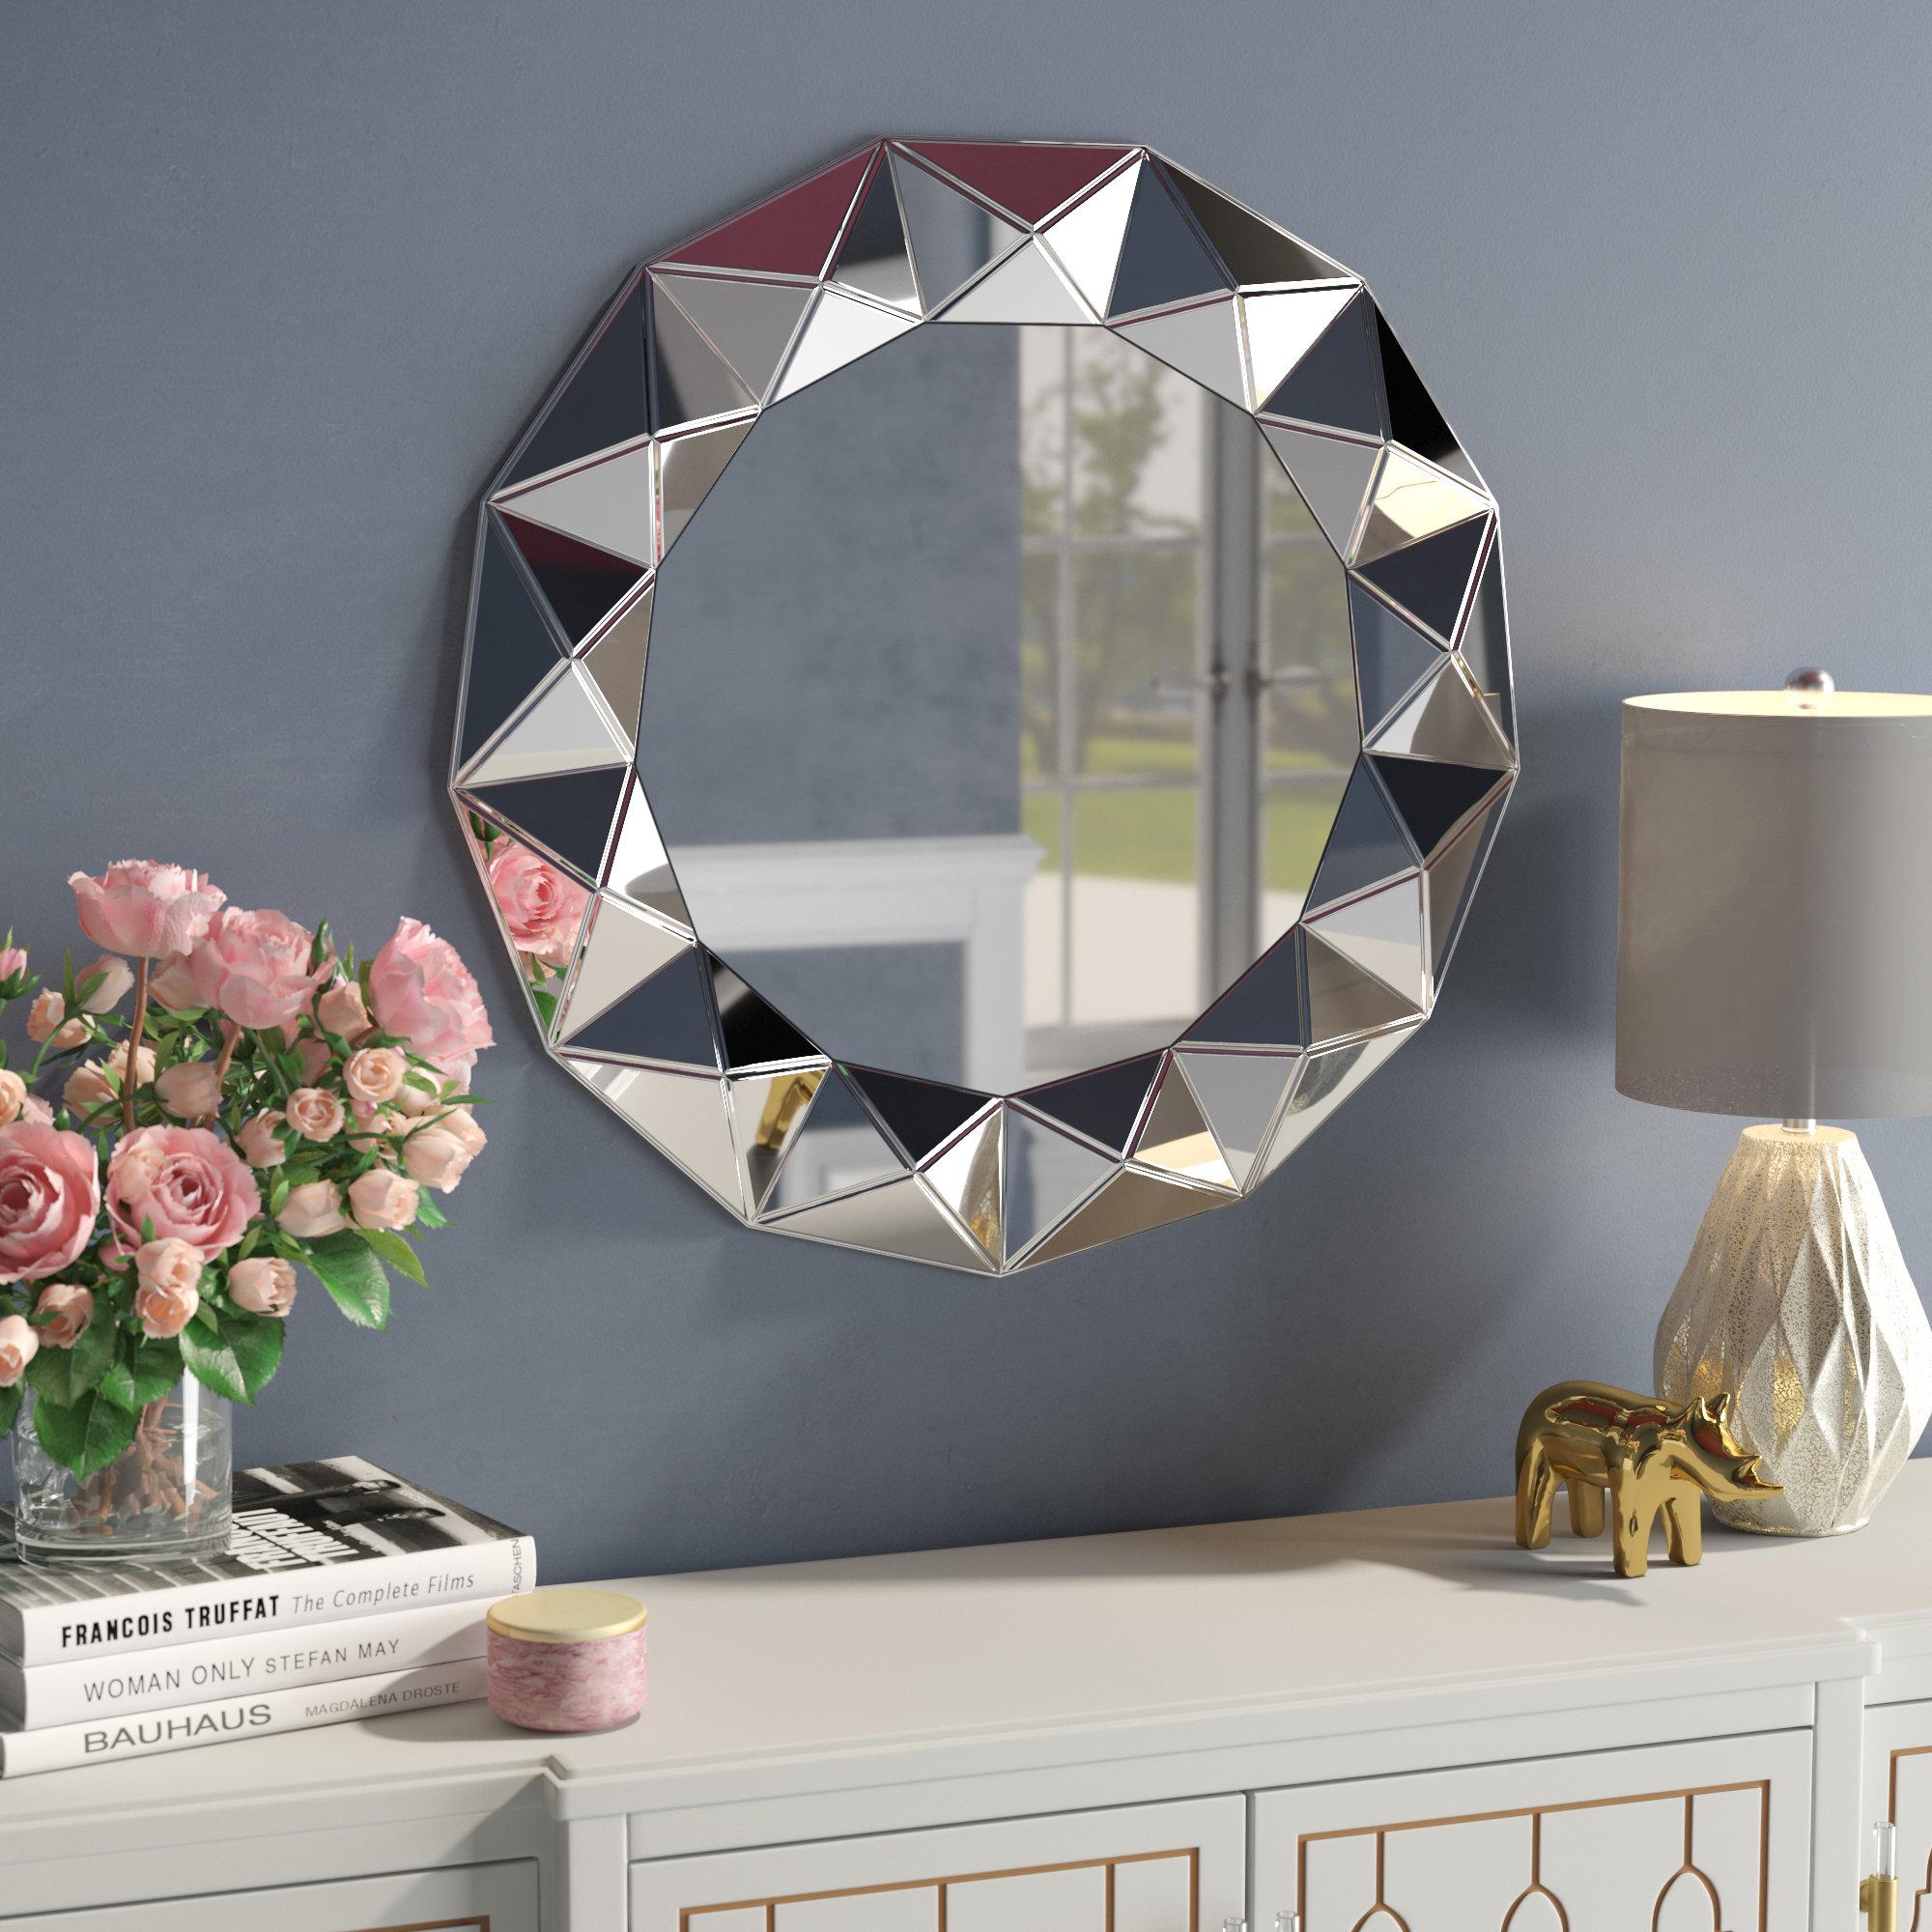 Decorative Hallway Wall Mirror | Wayfair For Bem Decorative Wall Mirrors (View 5 of 20)